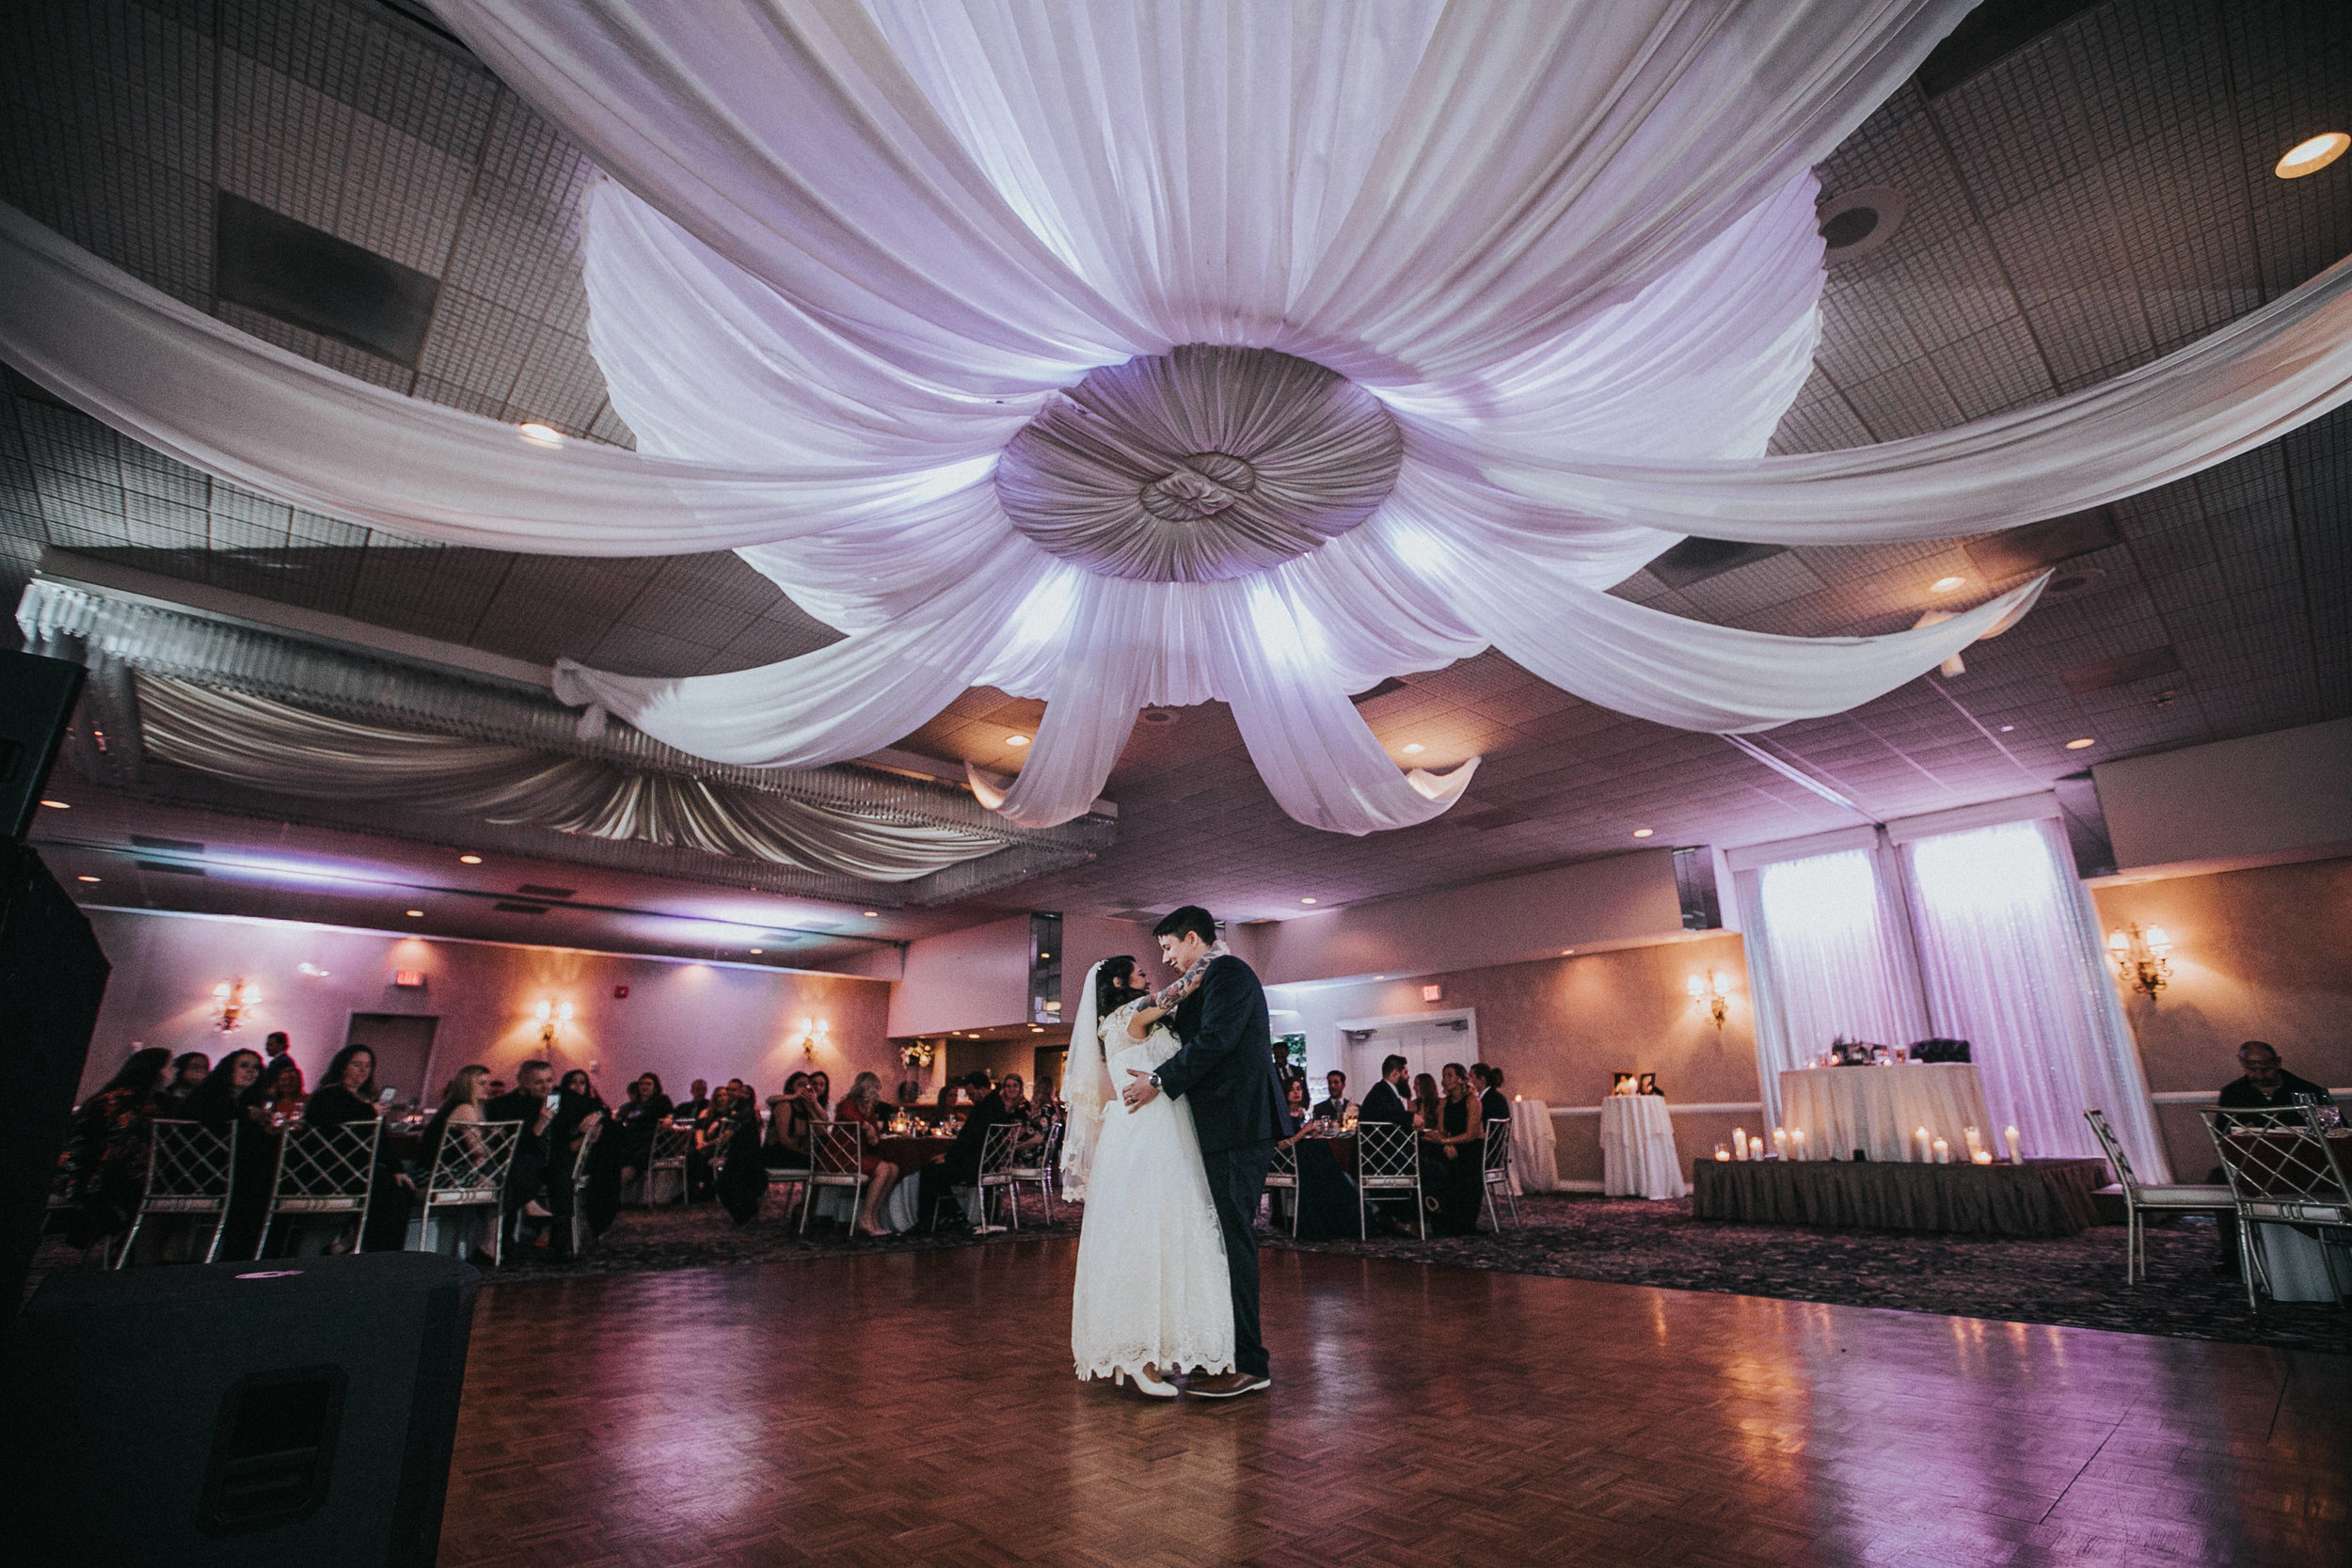 New-Jersey-Wedding-Photographer-ReceptionCenter-Valeria&Mike-Reception (10 of 265).jpg